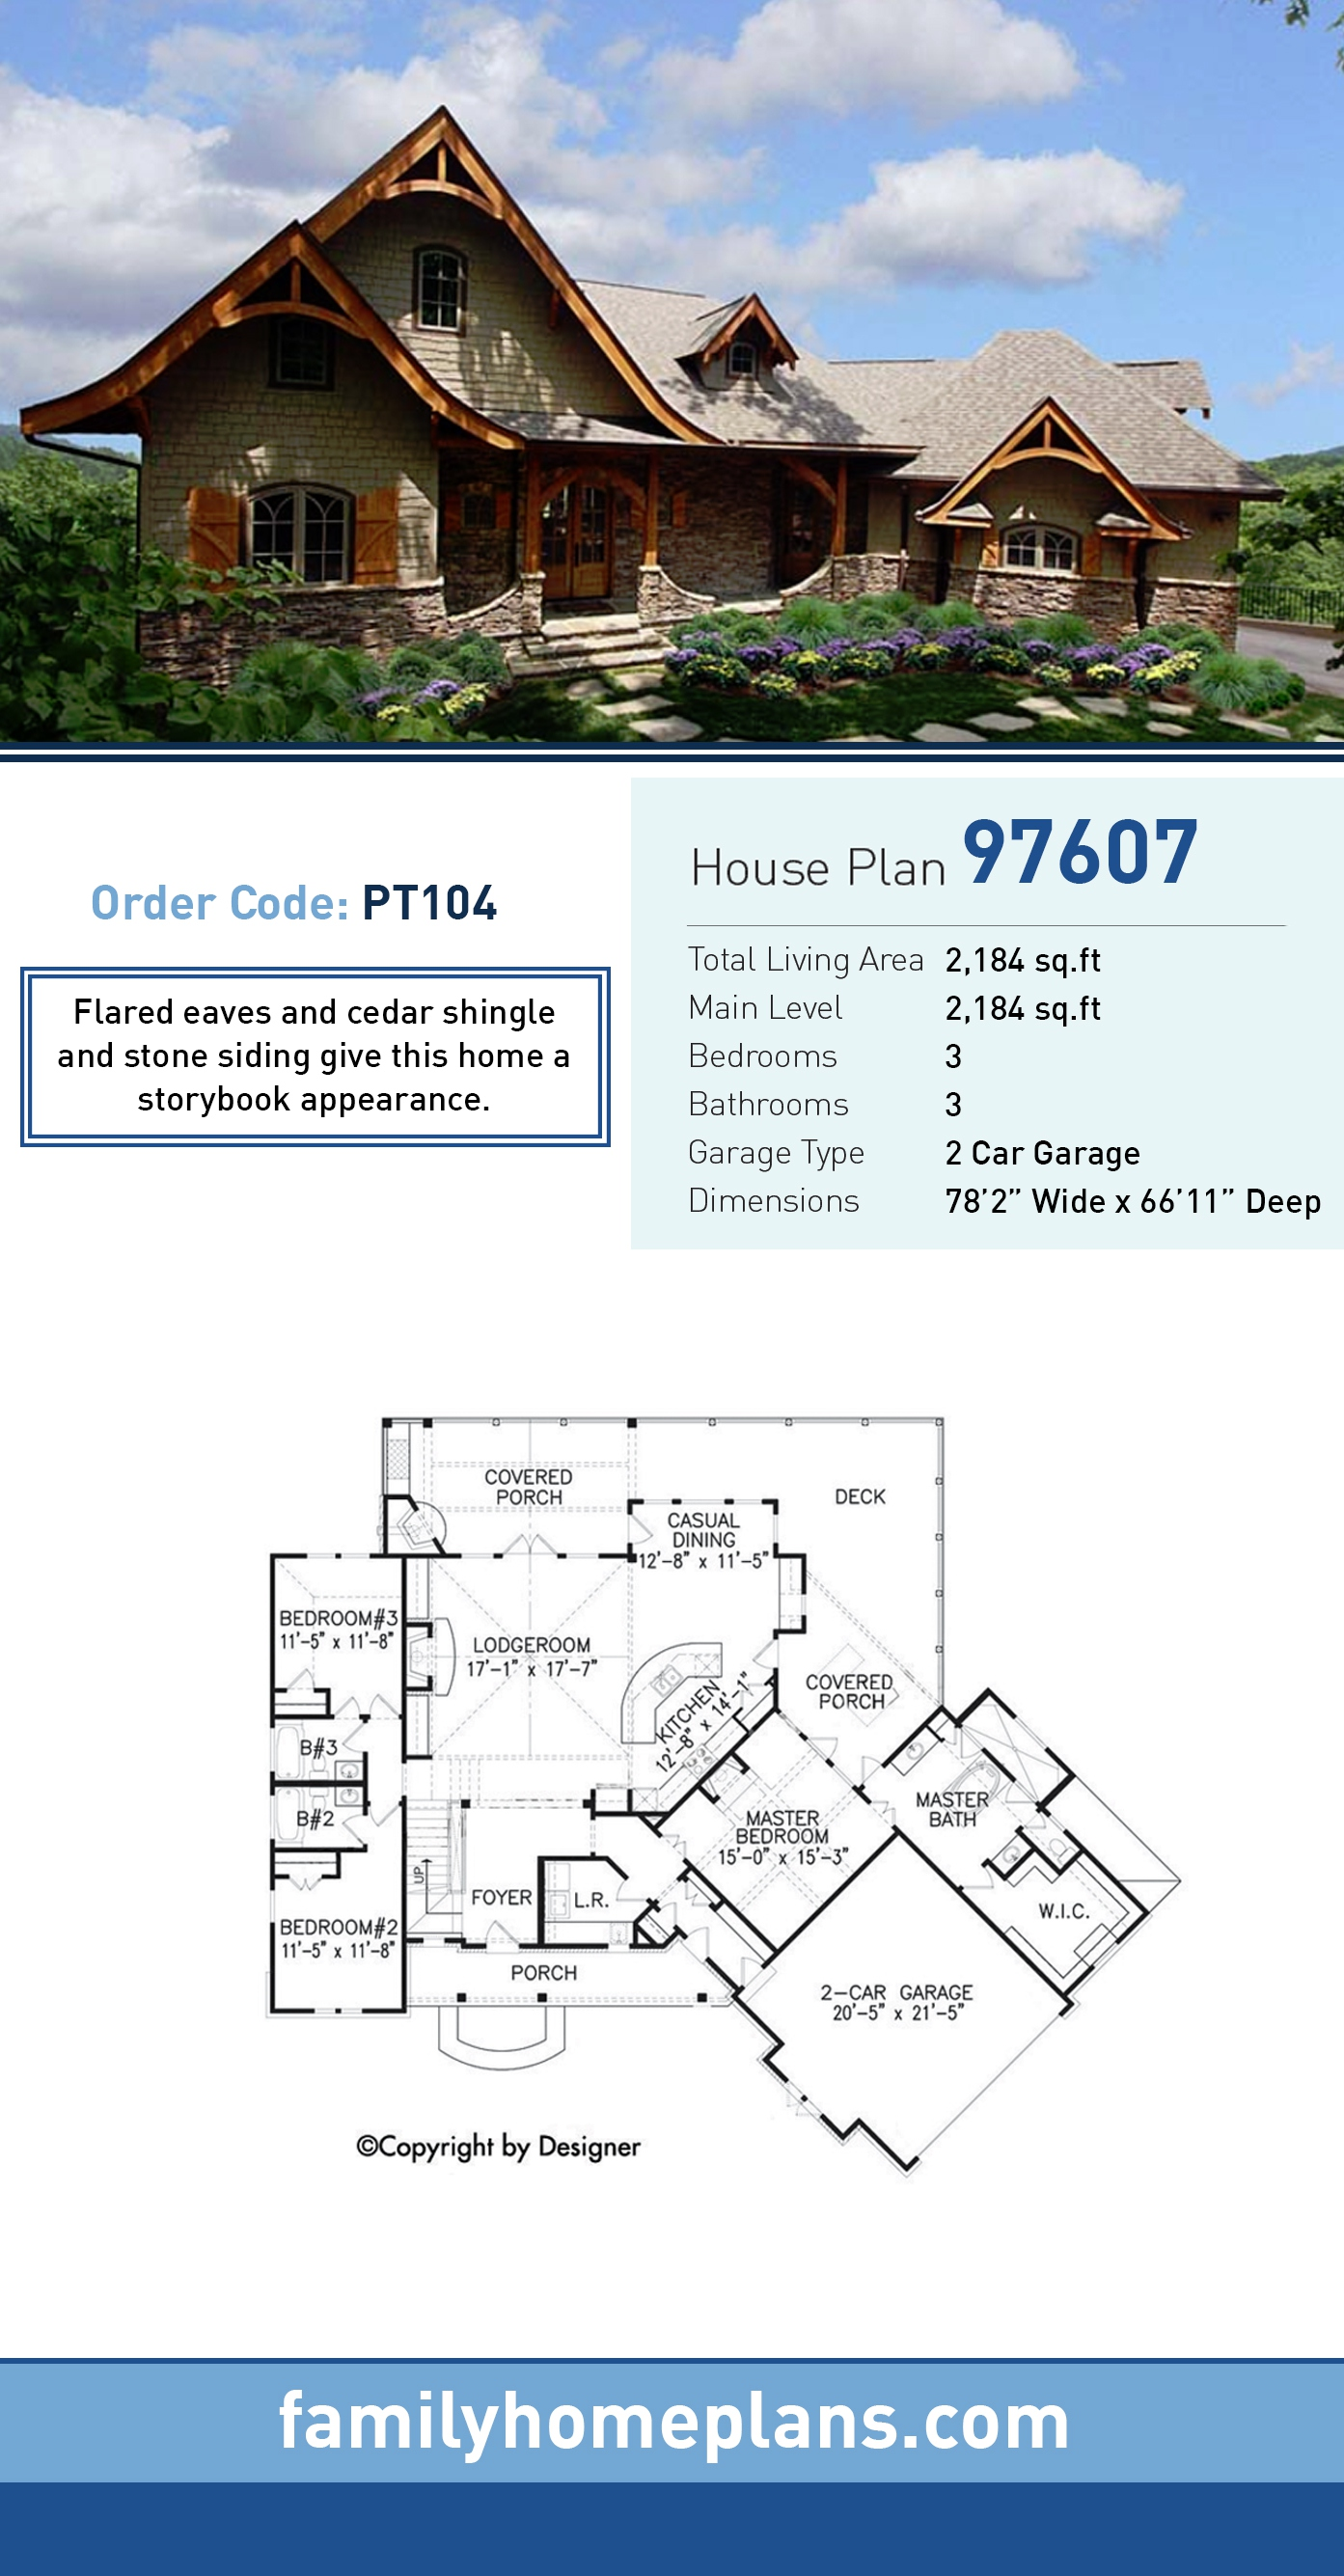 Cottage , Country , Craftsman , European , Tudor House Plan 97607 with 3 Beds, 3 Baths, 2 Car Garage